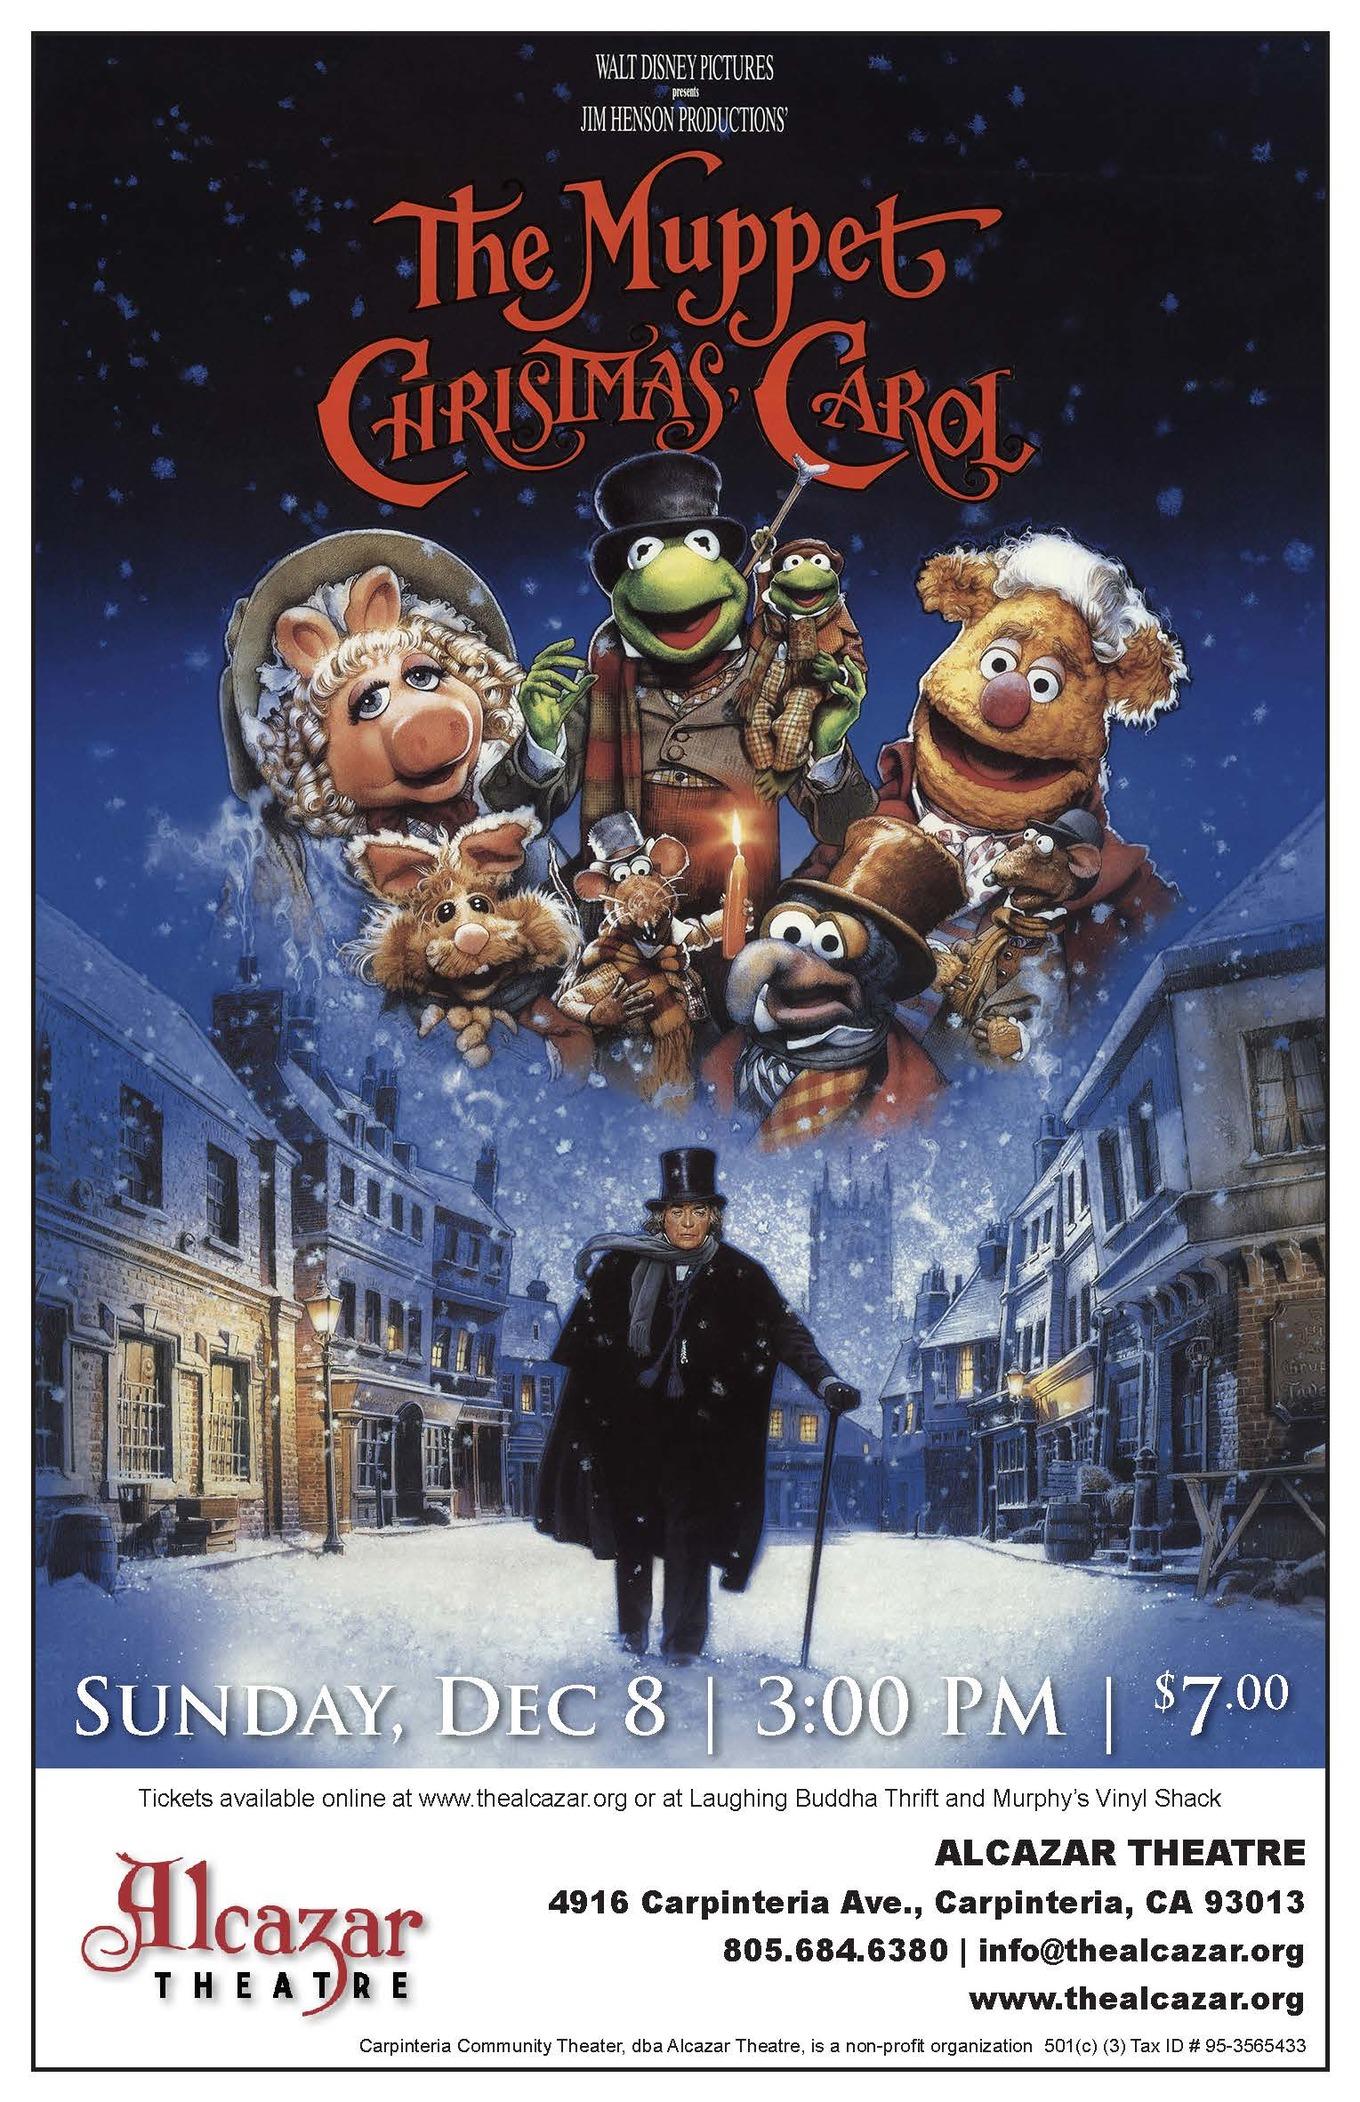 The Muppet Christmas Carol - Tickets - Alcazar Theatre, Carpinteria, CA - December 8, 2019